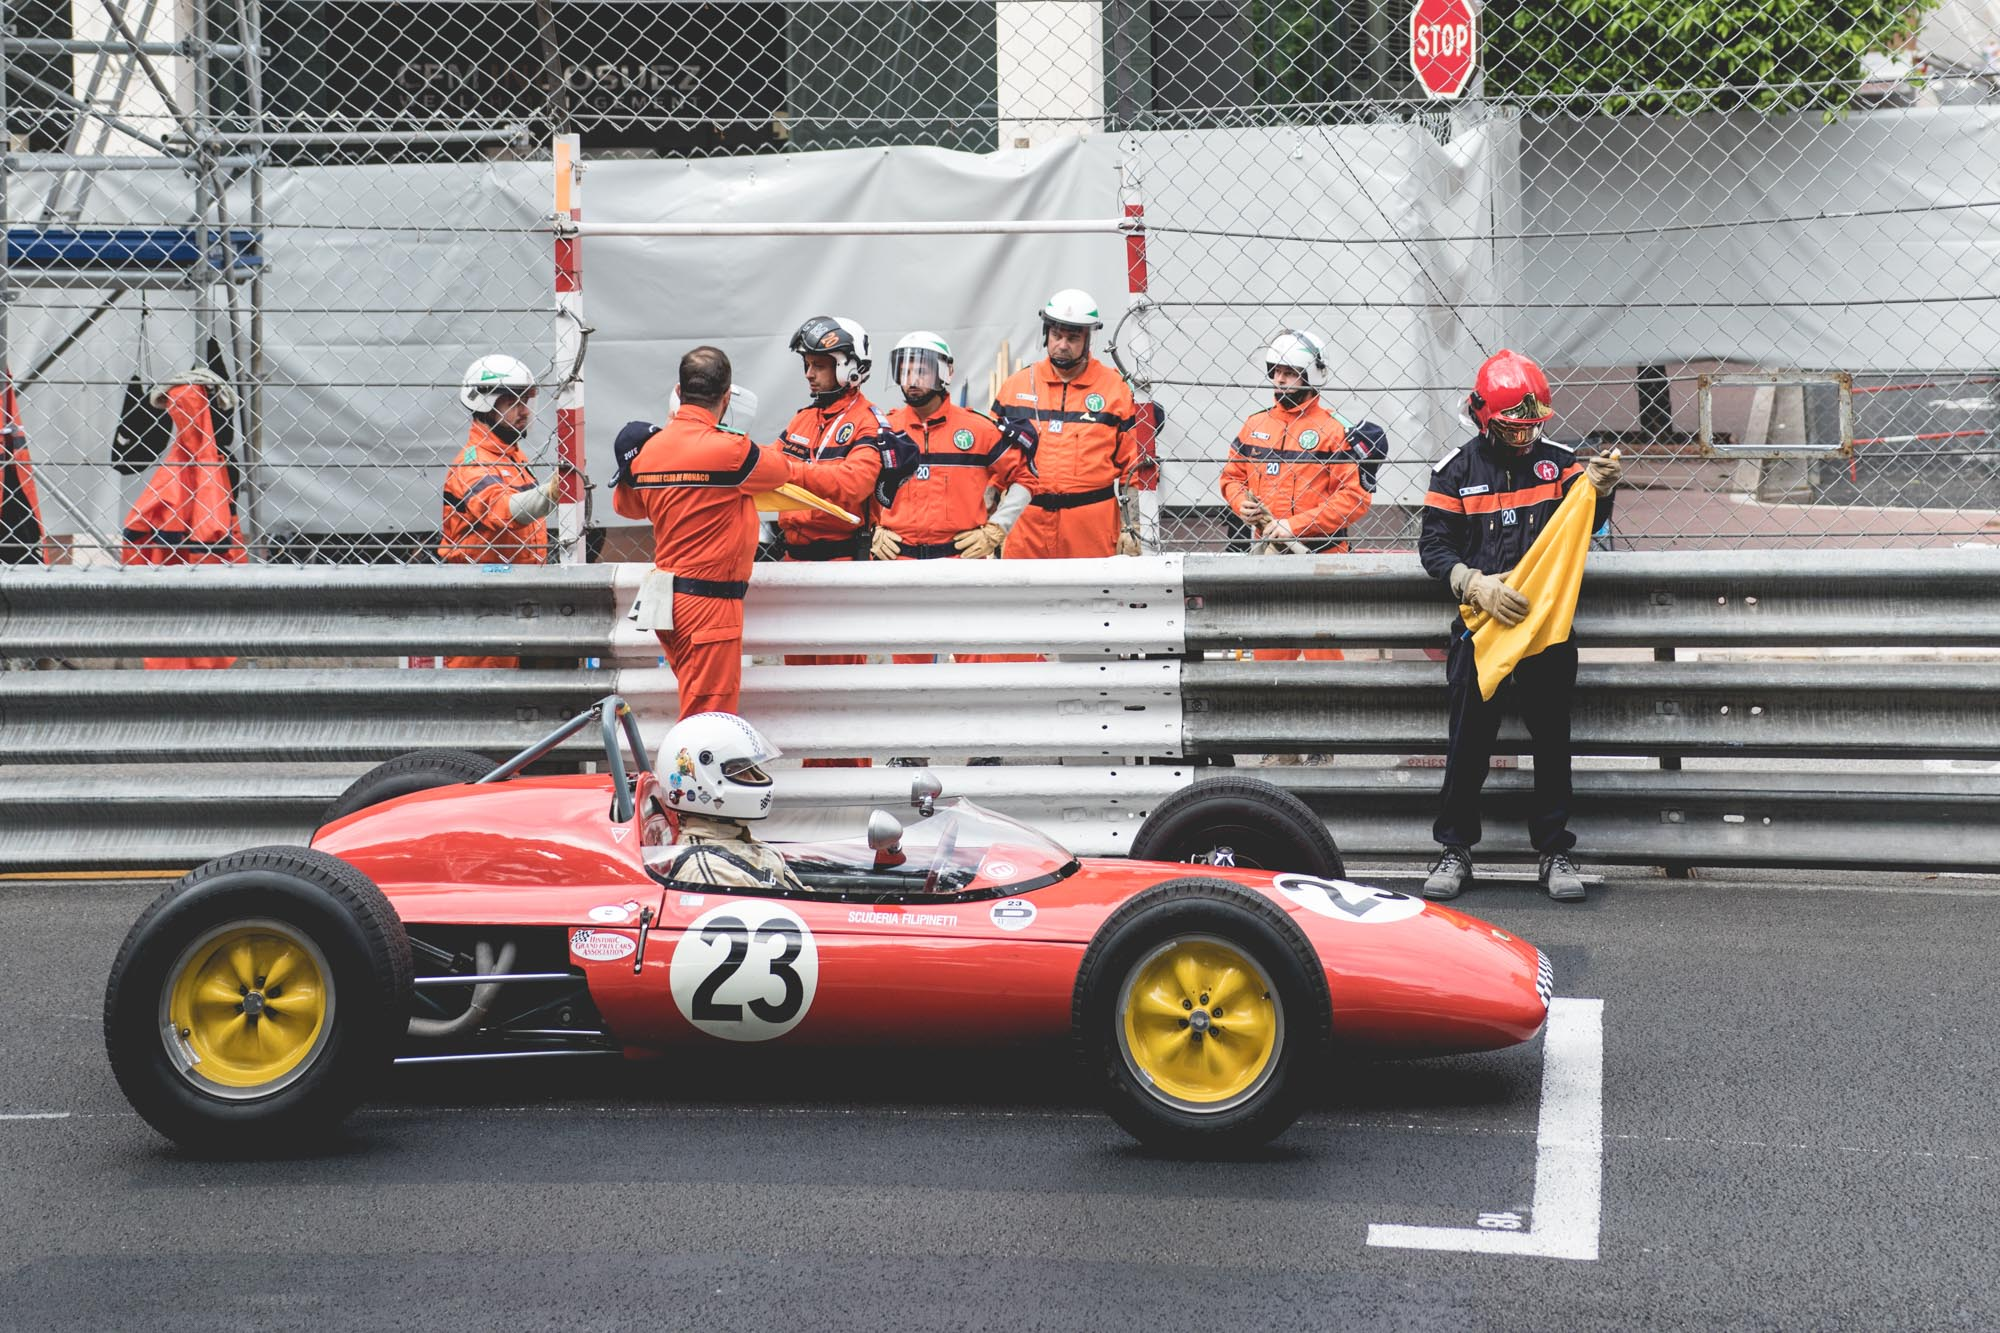 Grand Prix de Monaco Historique - Lotus 21